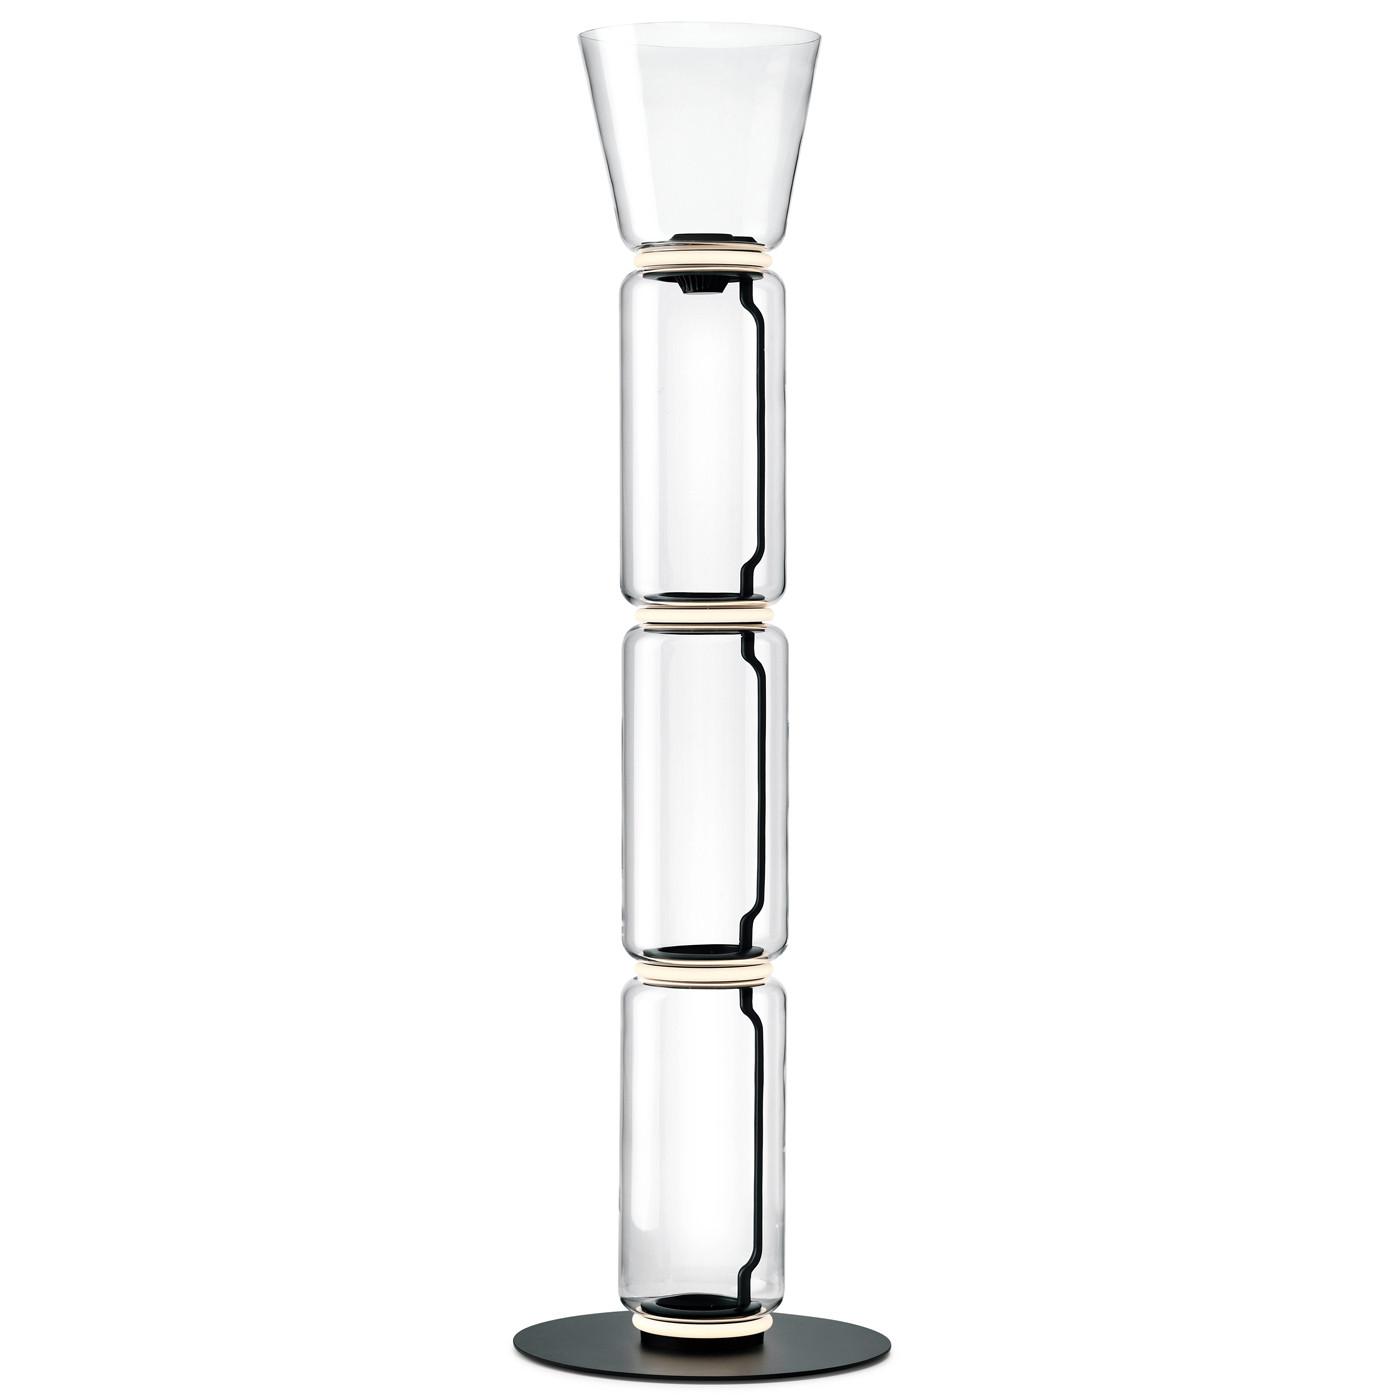 Flos Noctambule High Cylinders & Cone LED